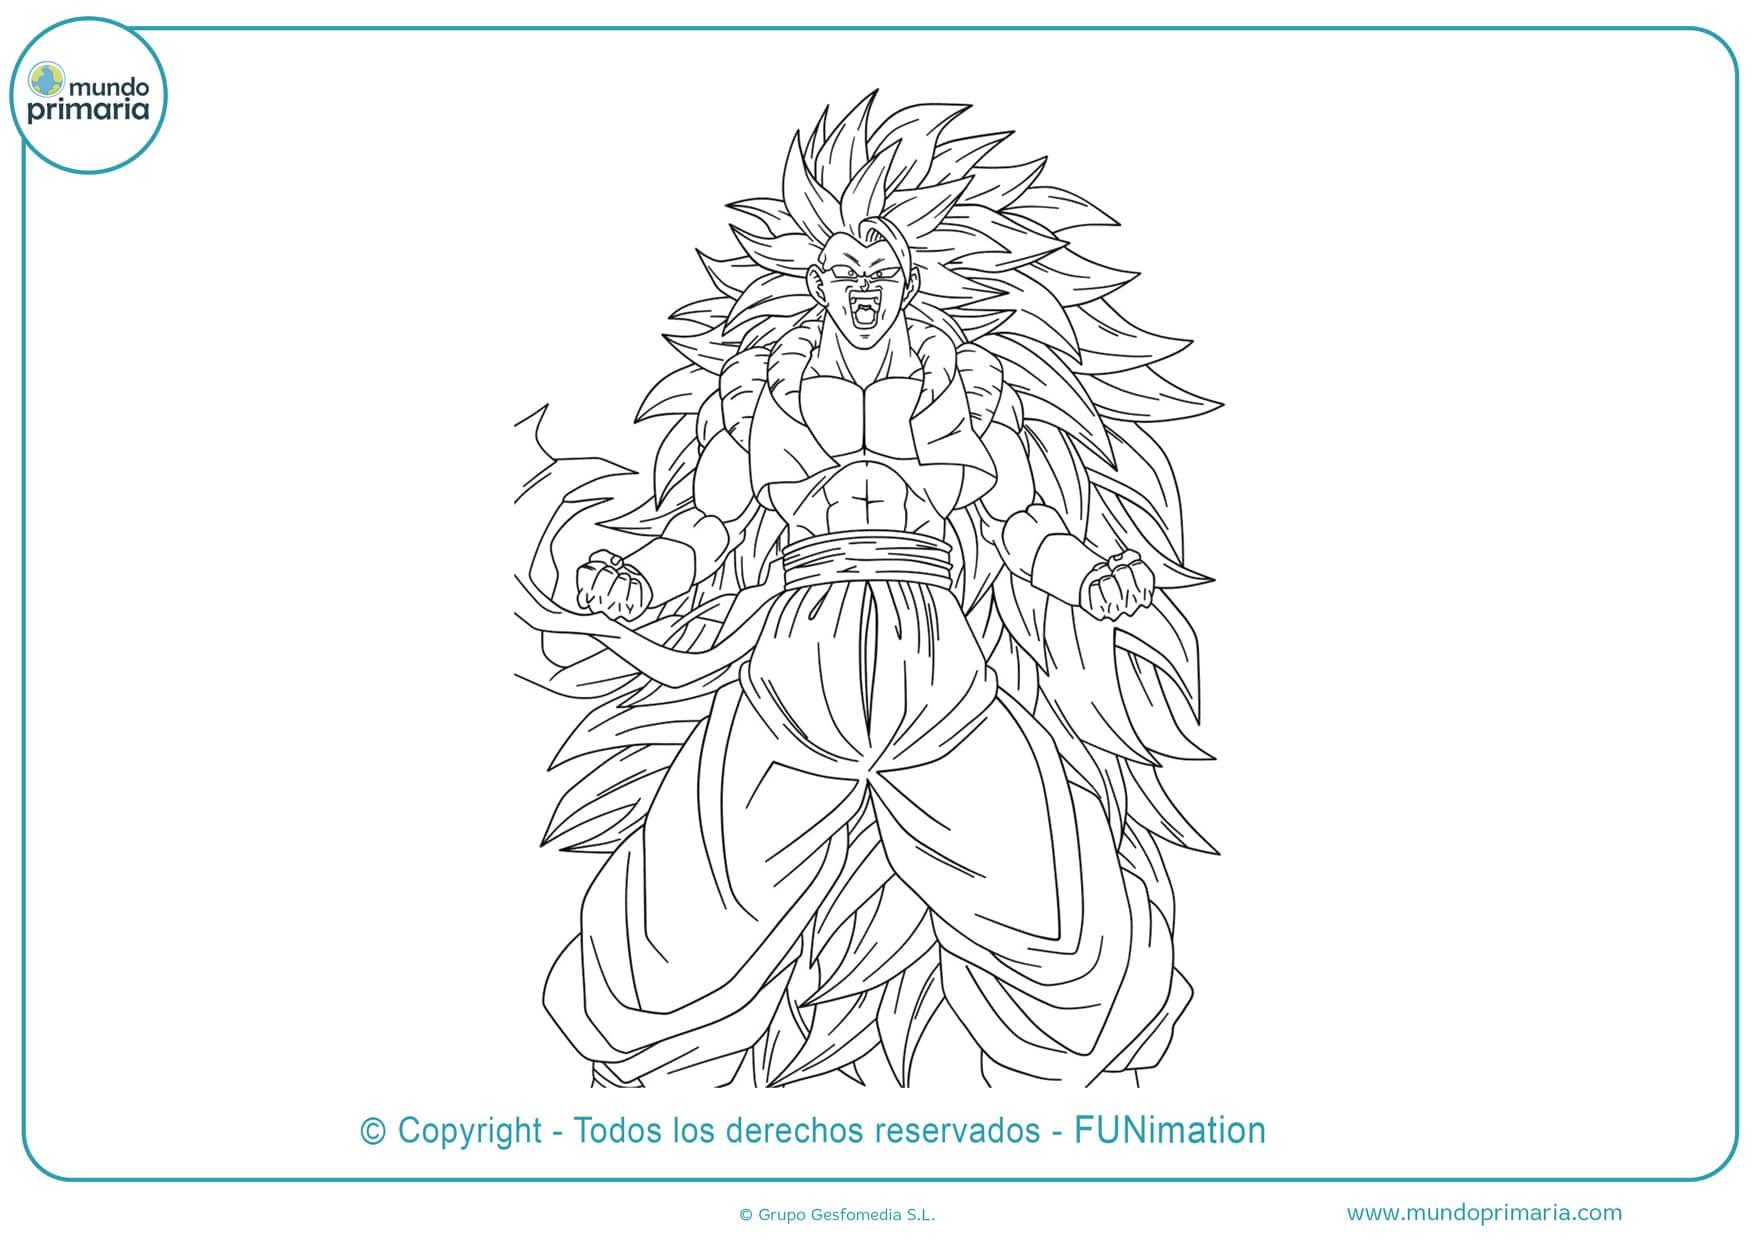 Cómo dibujar a Goku